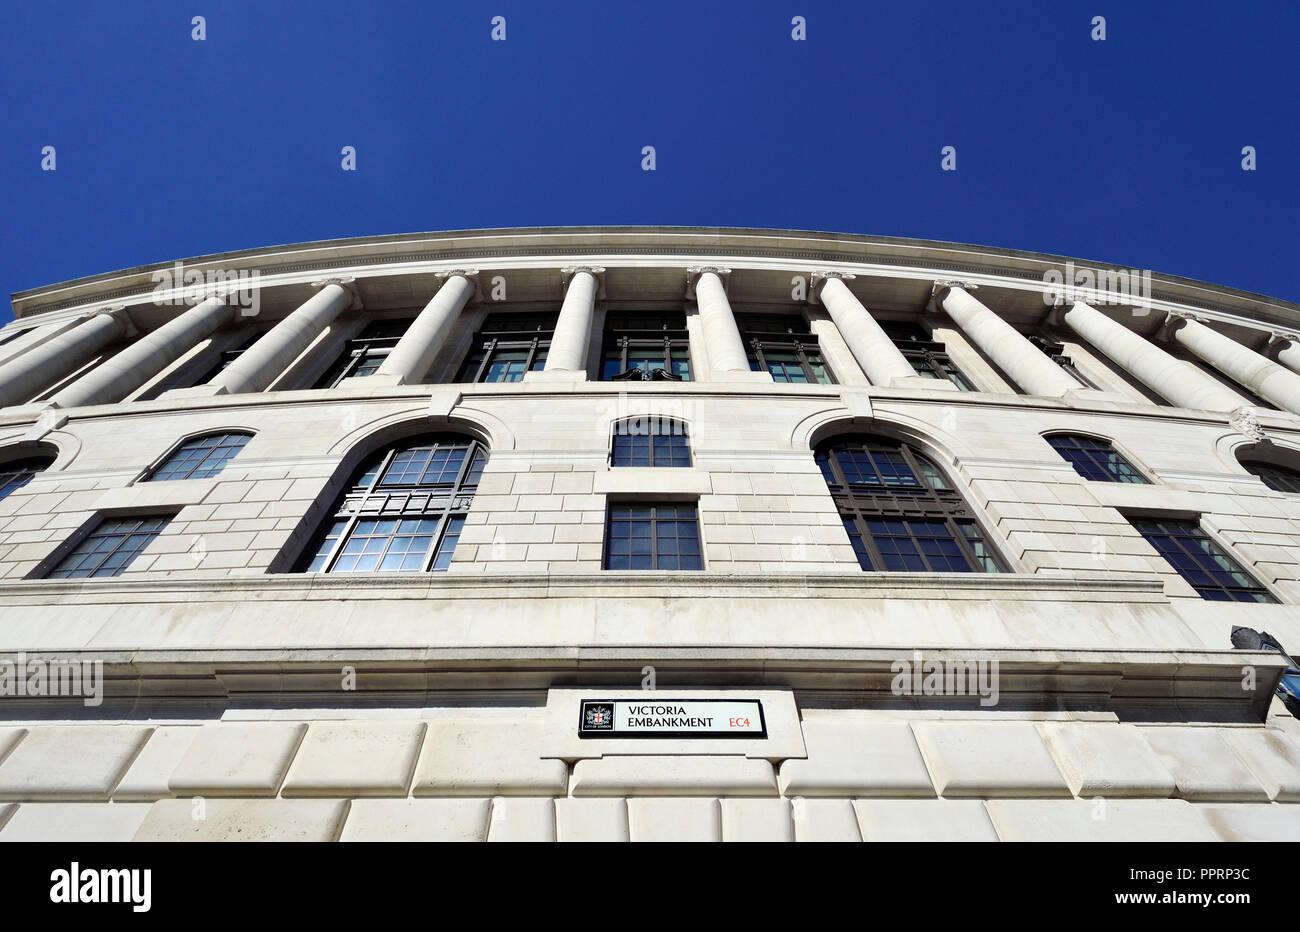 Unilever House (1933: Neoclassical Art Deco) at 100, Victoria Embankment. London, England, UK. - Stock Image